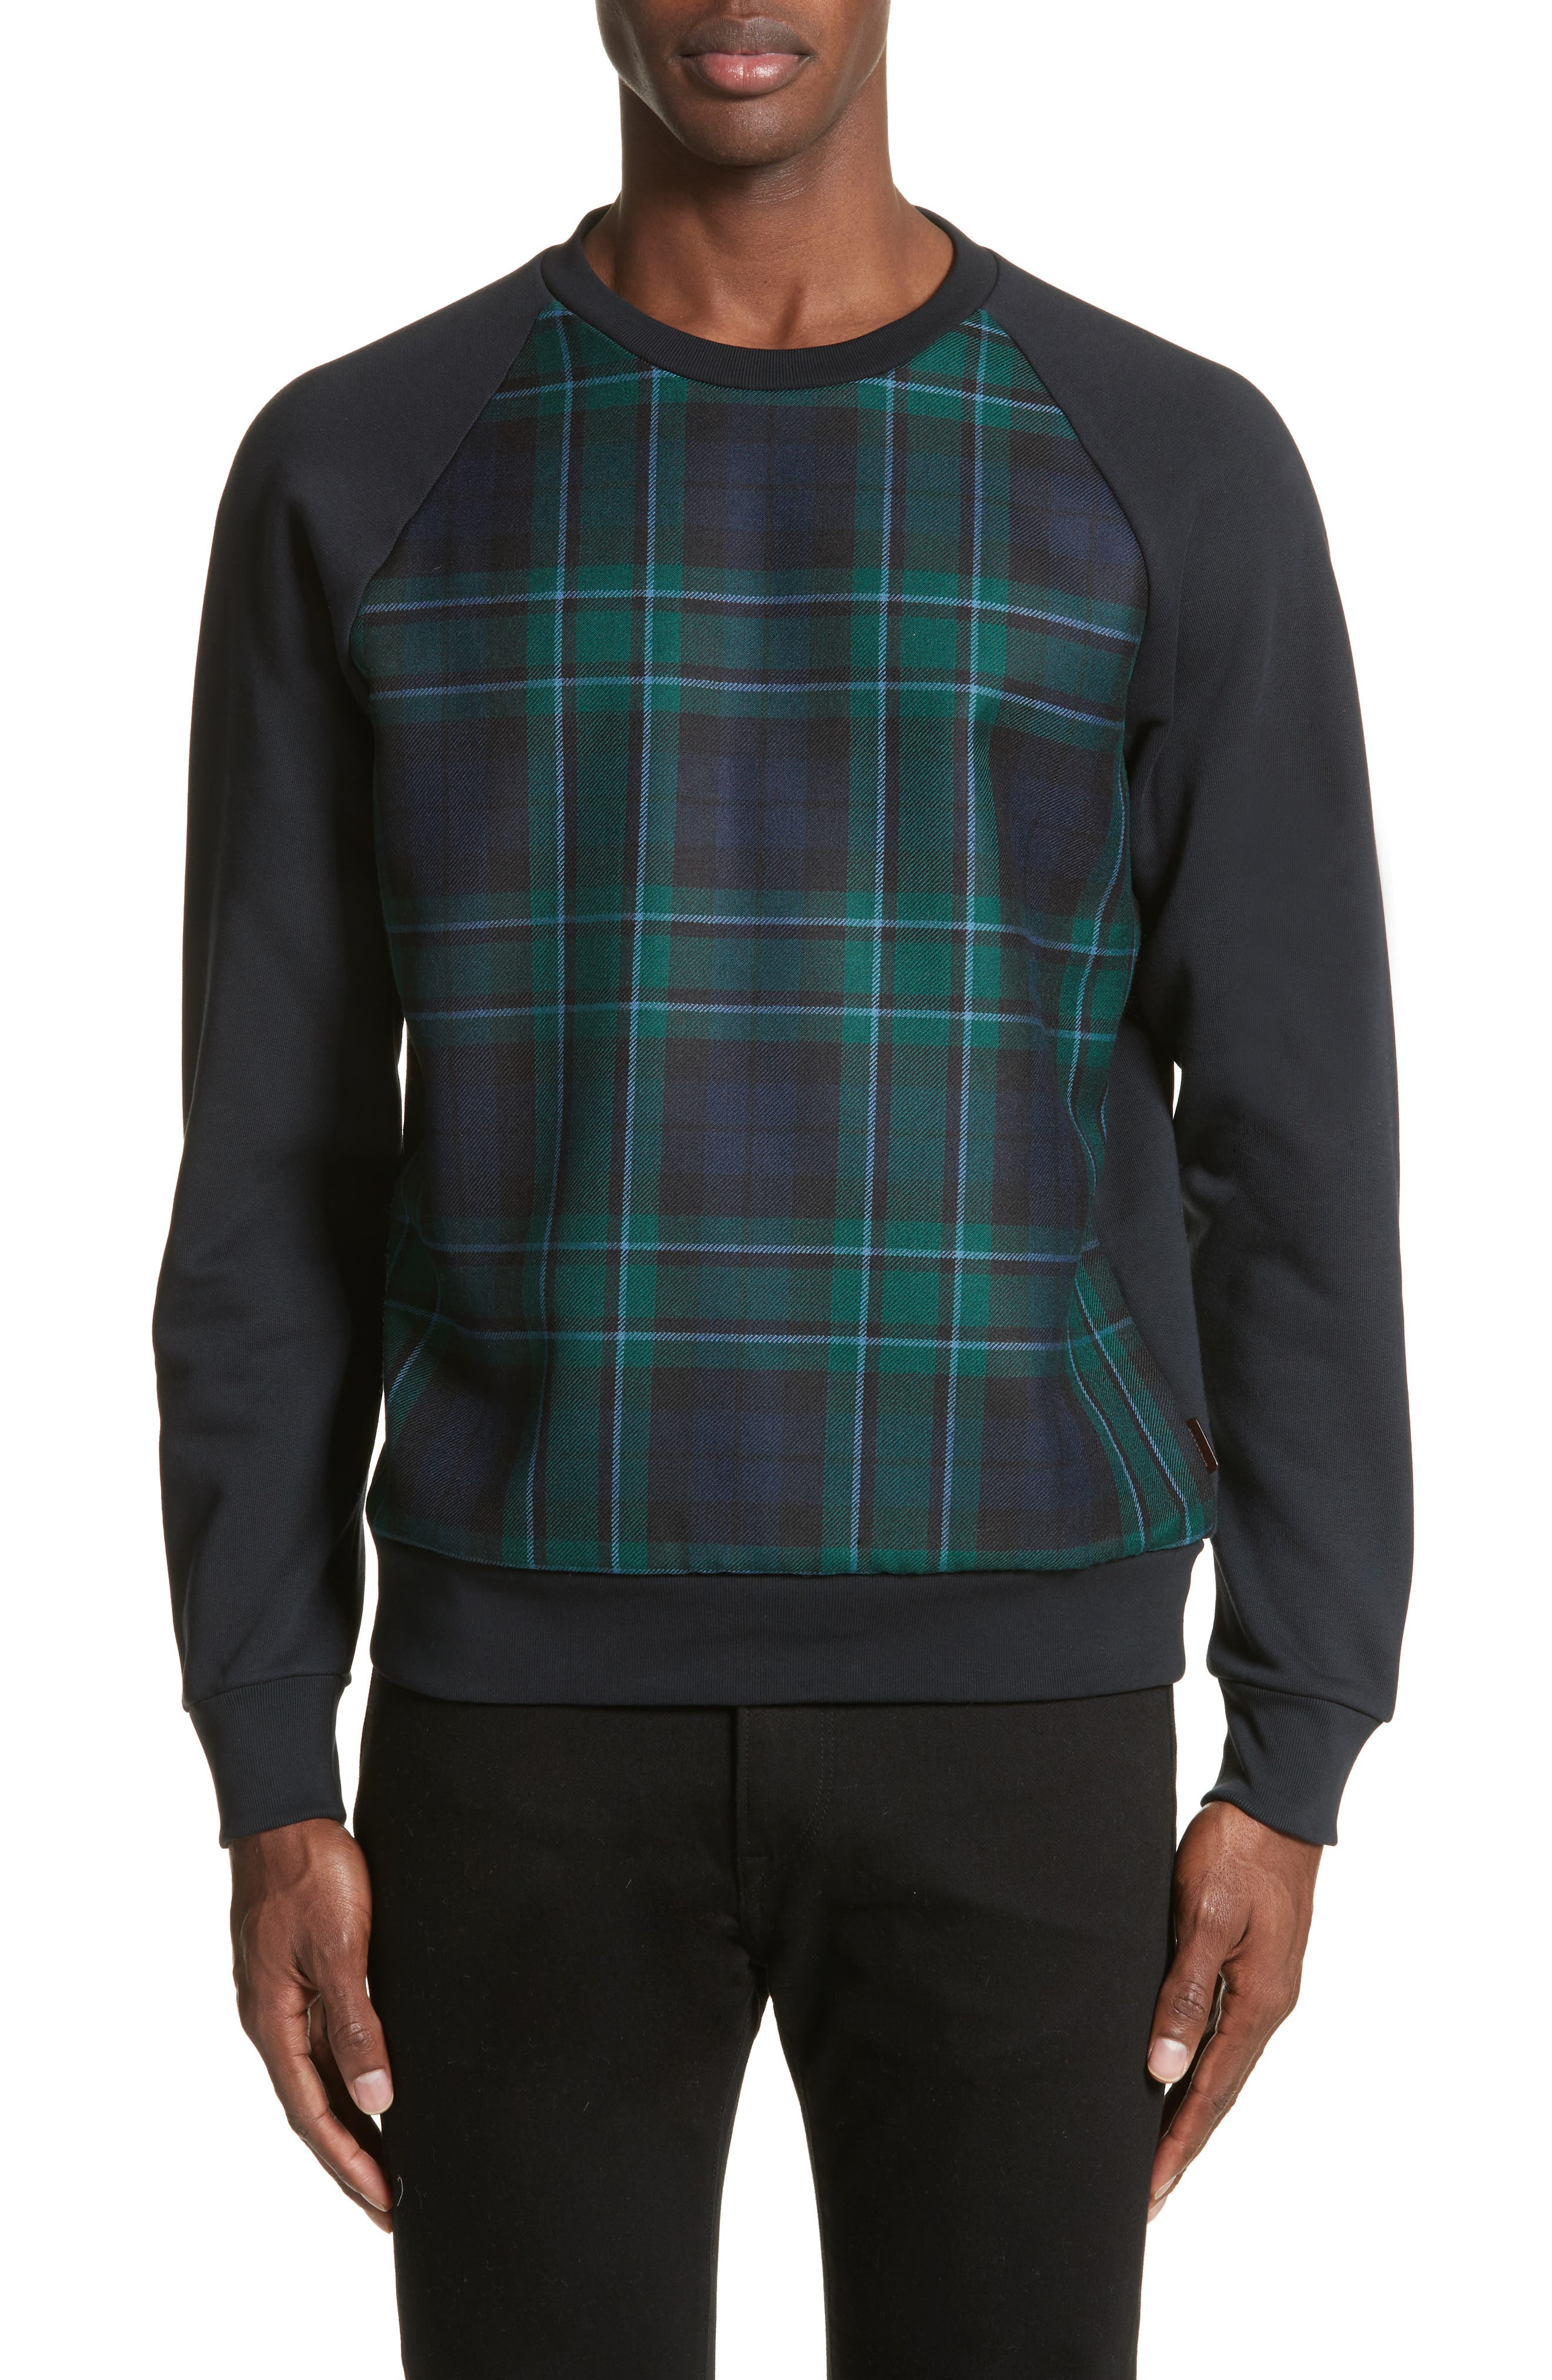 Alternate Image 1 Selected - Burberry Beachen Tartan Panel Jersey Sweatshirt